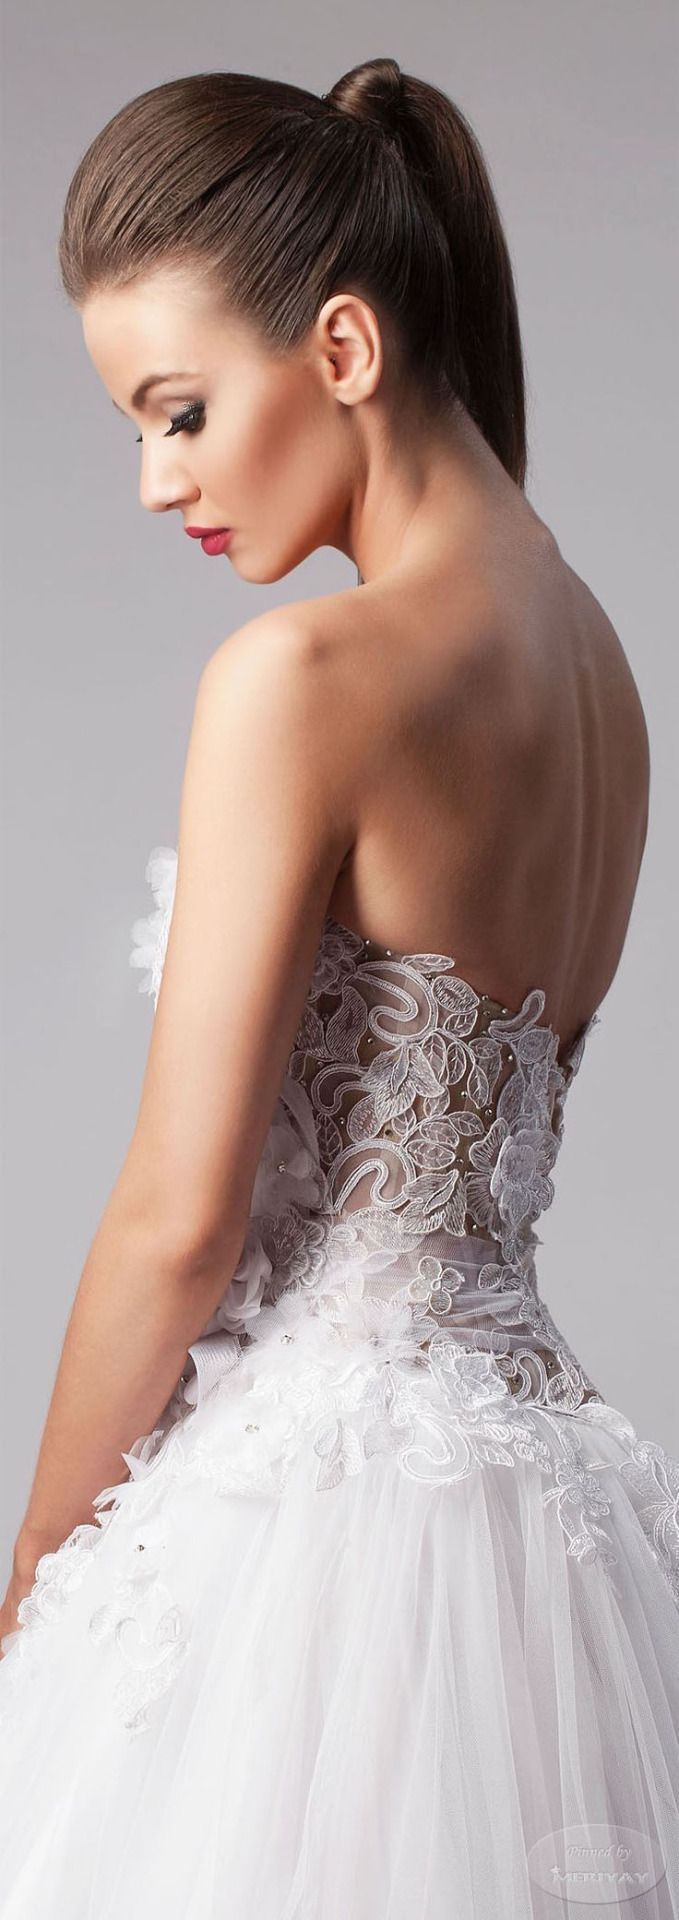 best The Princess  Parlor images on Pinterest  Bridal